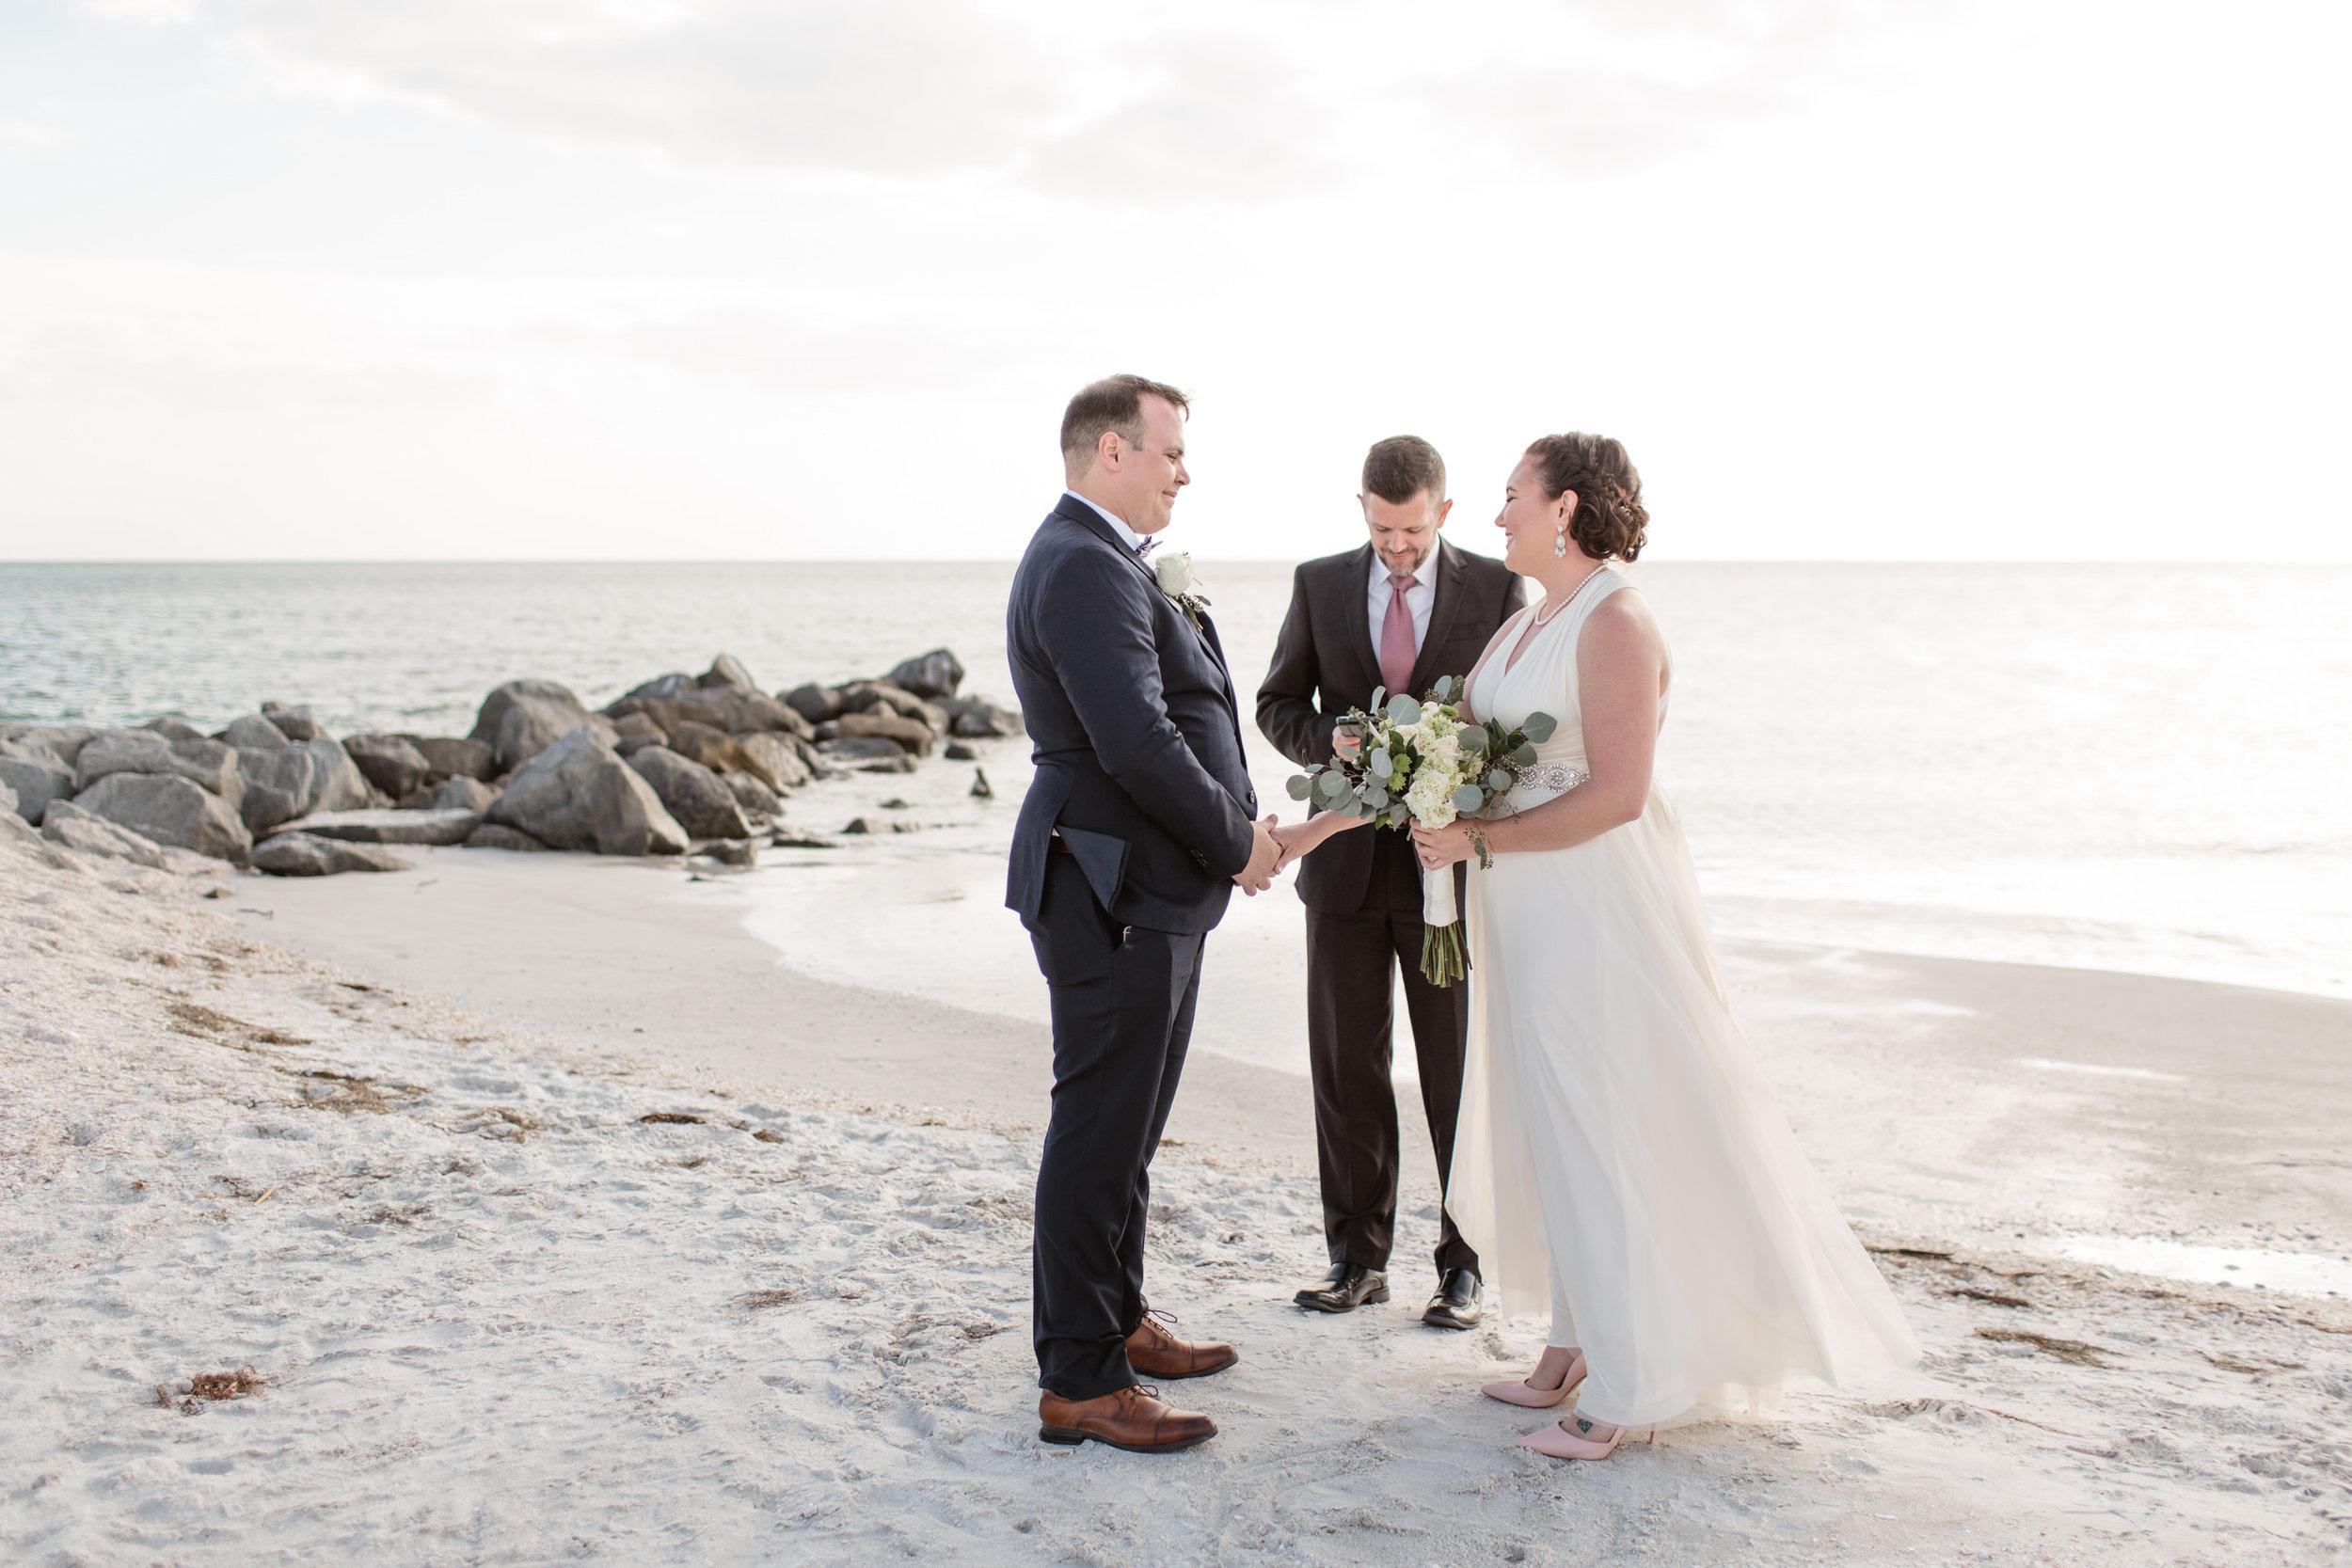 Beltran_Treasure_Island_Elopement_Tampa_Wedding_006-1.jpg